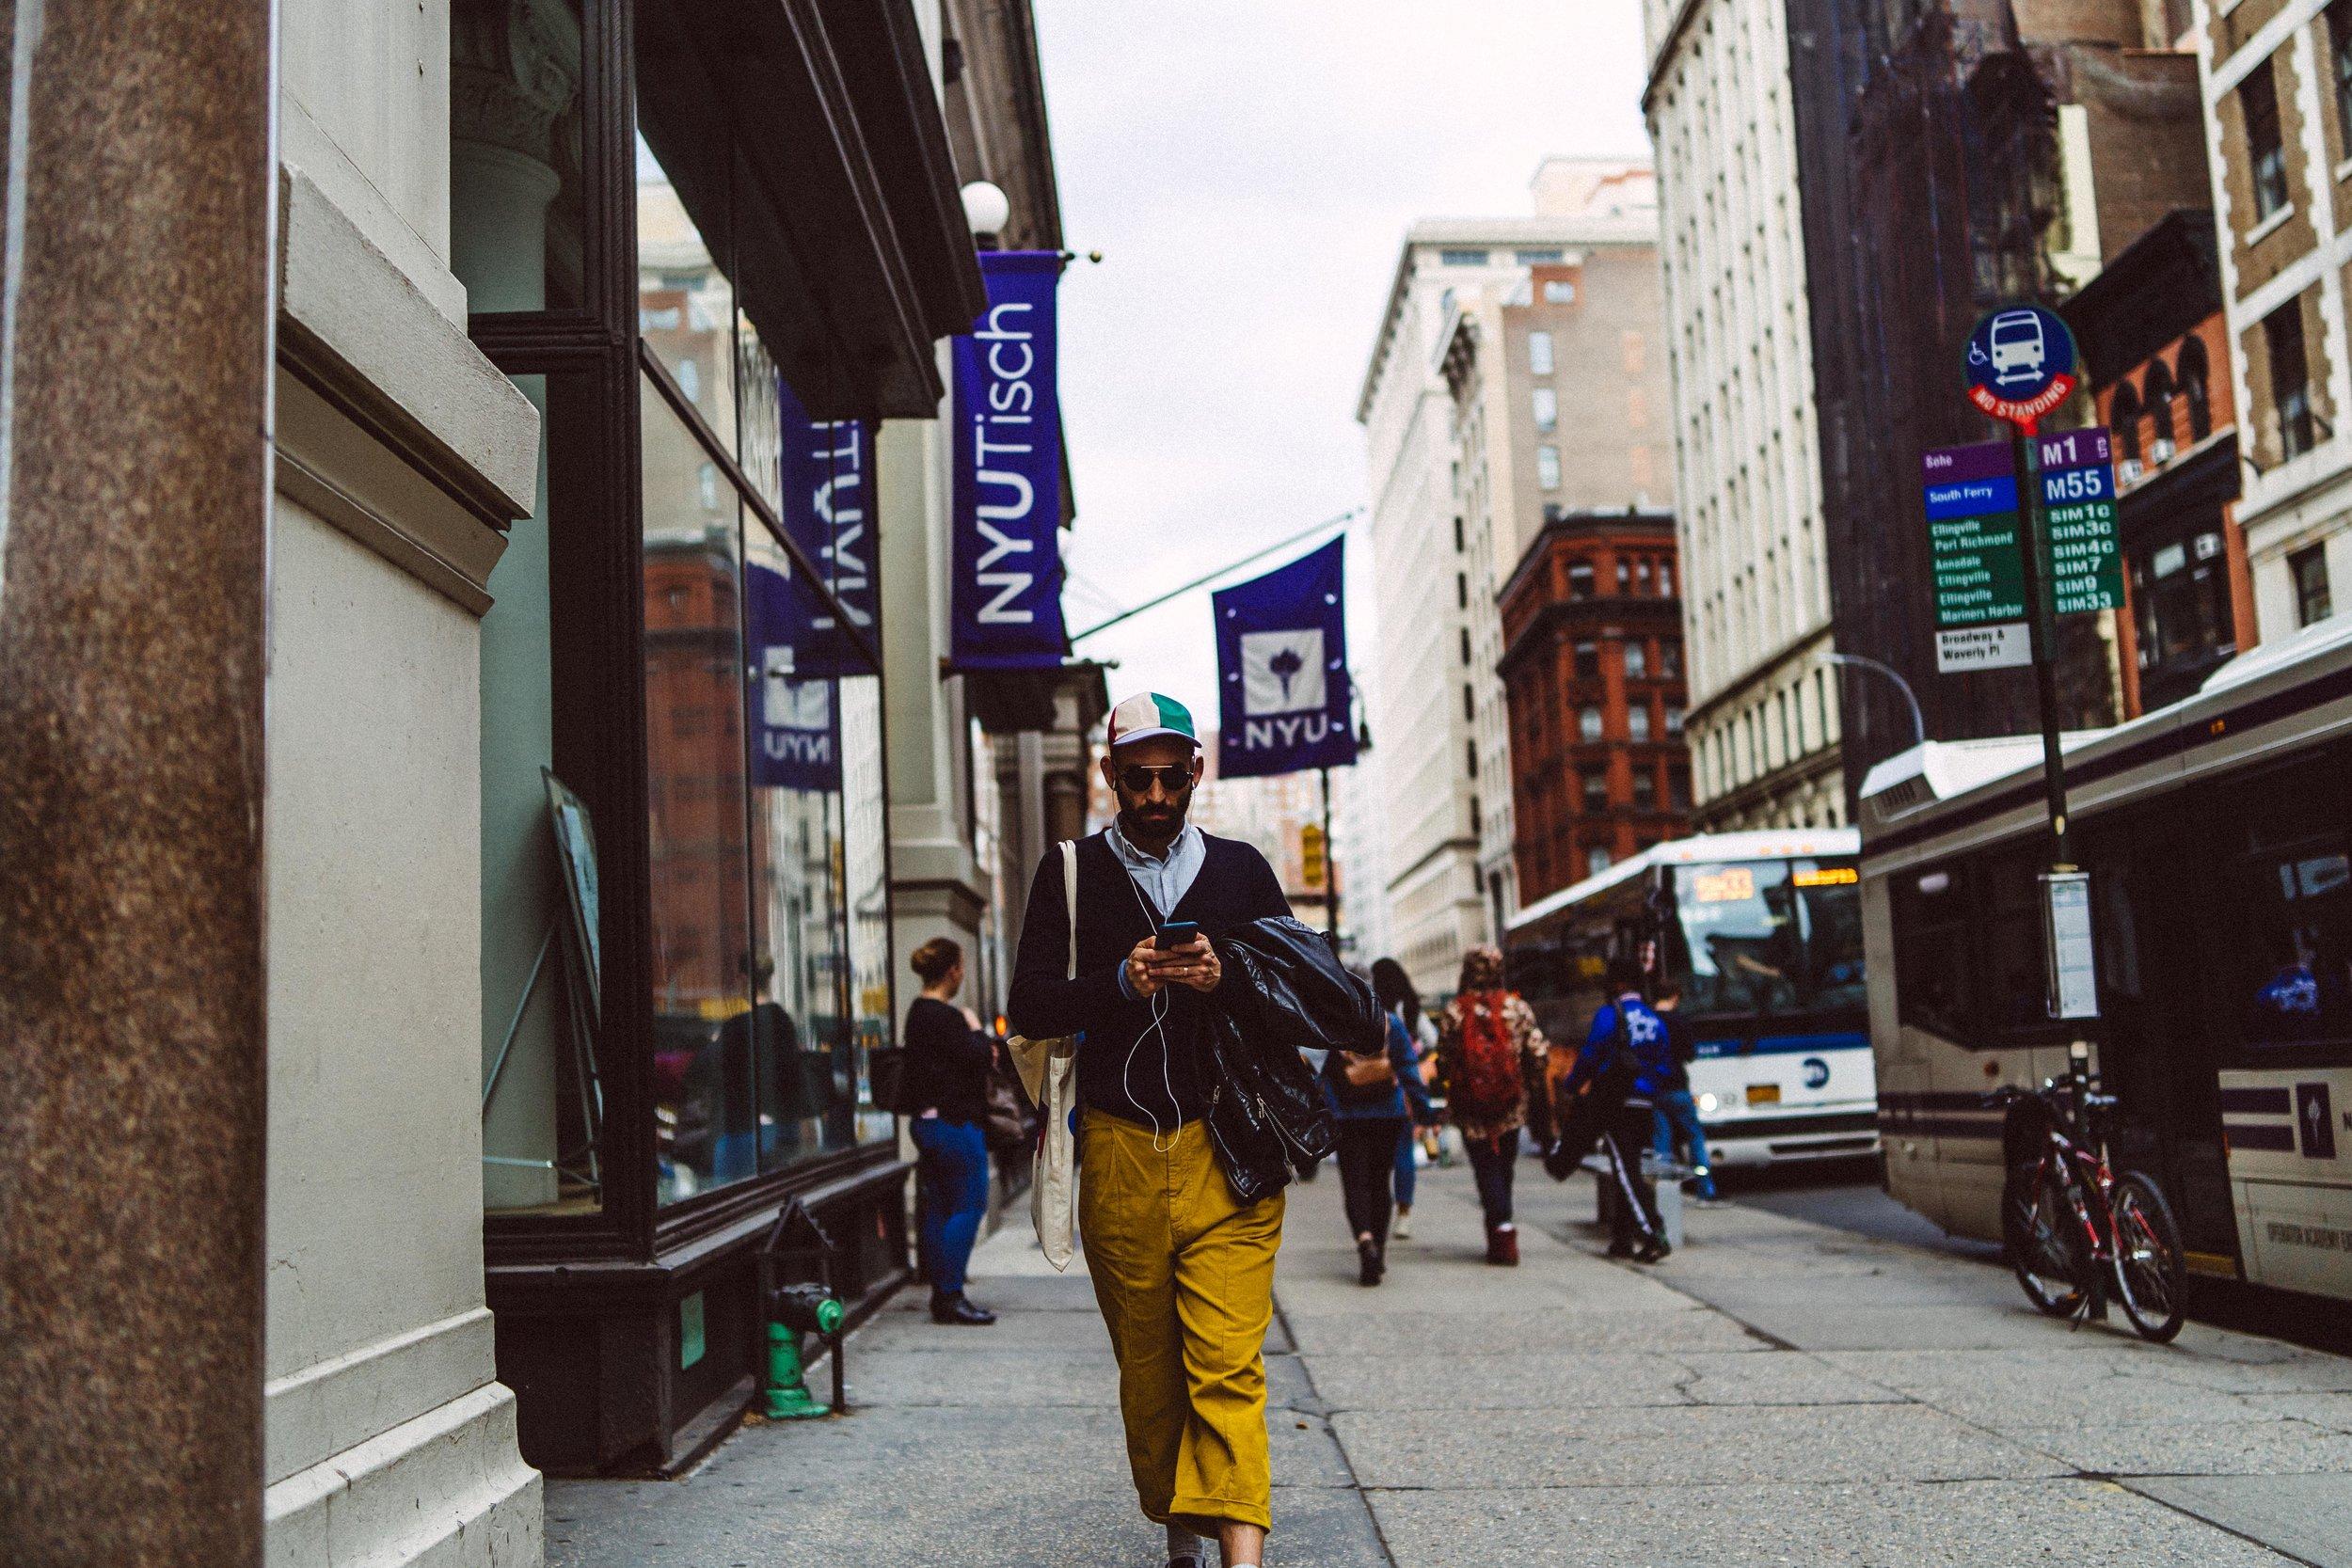 newyork-sony-102612.jpg